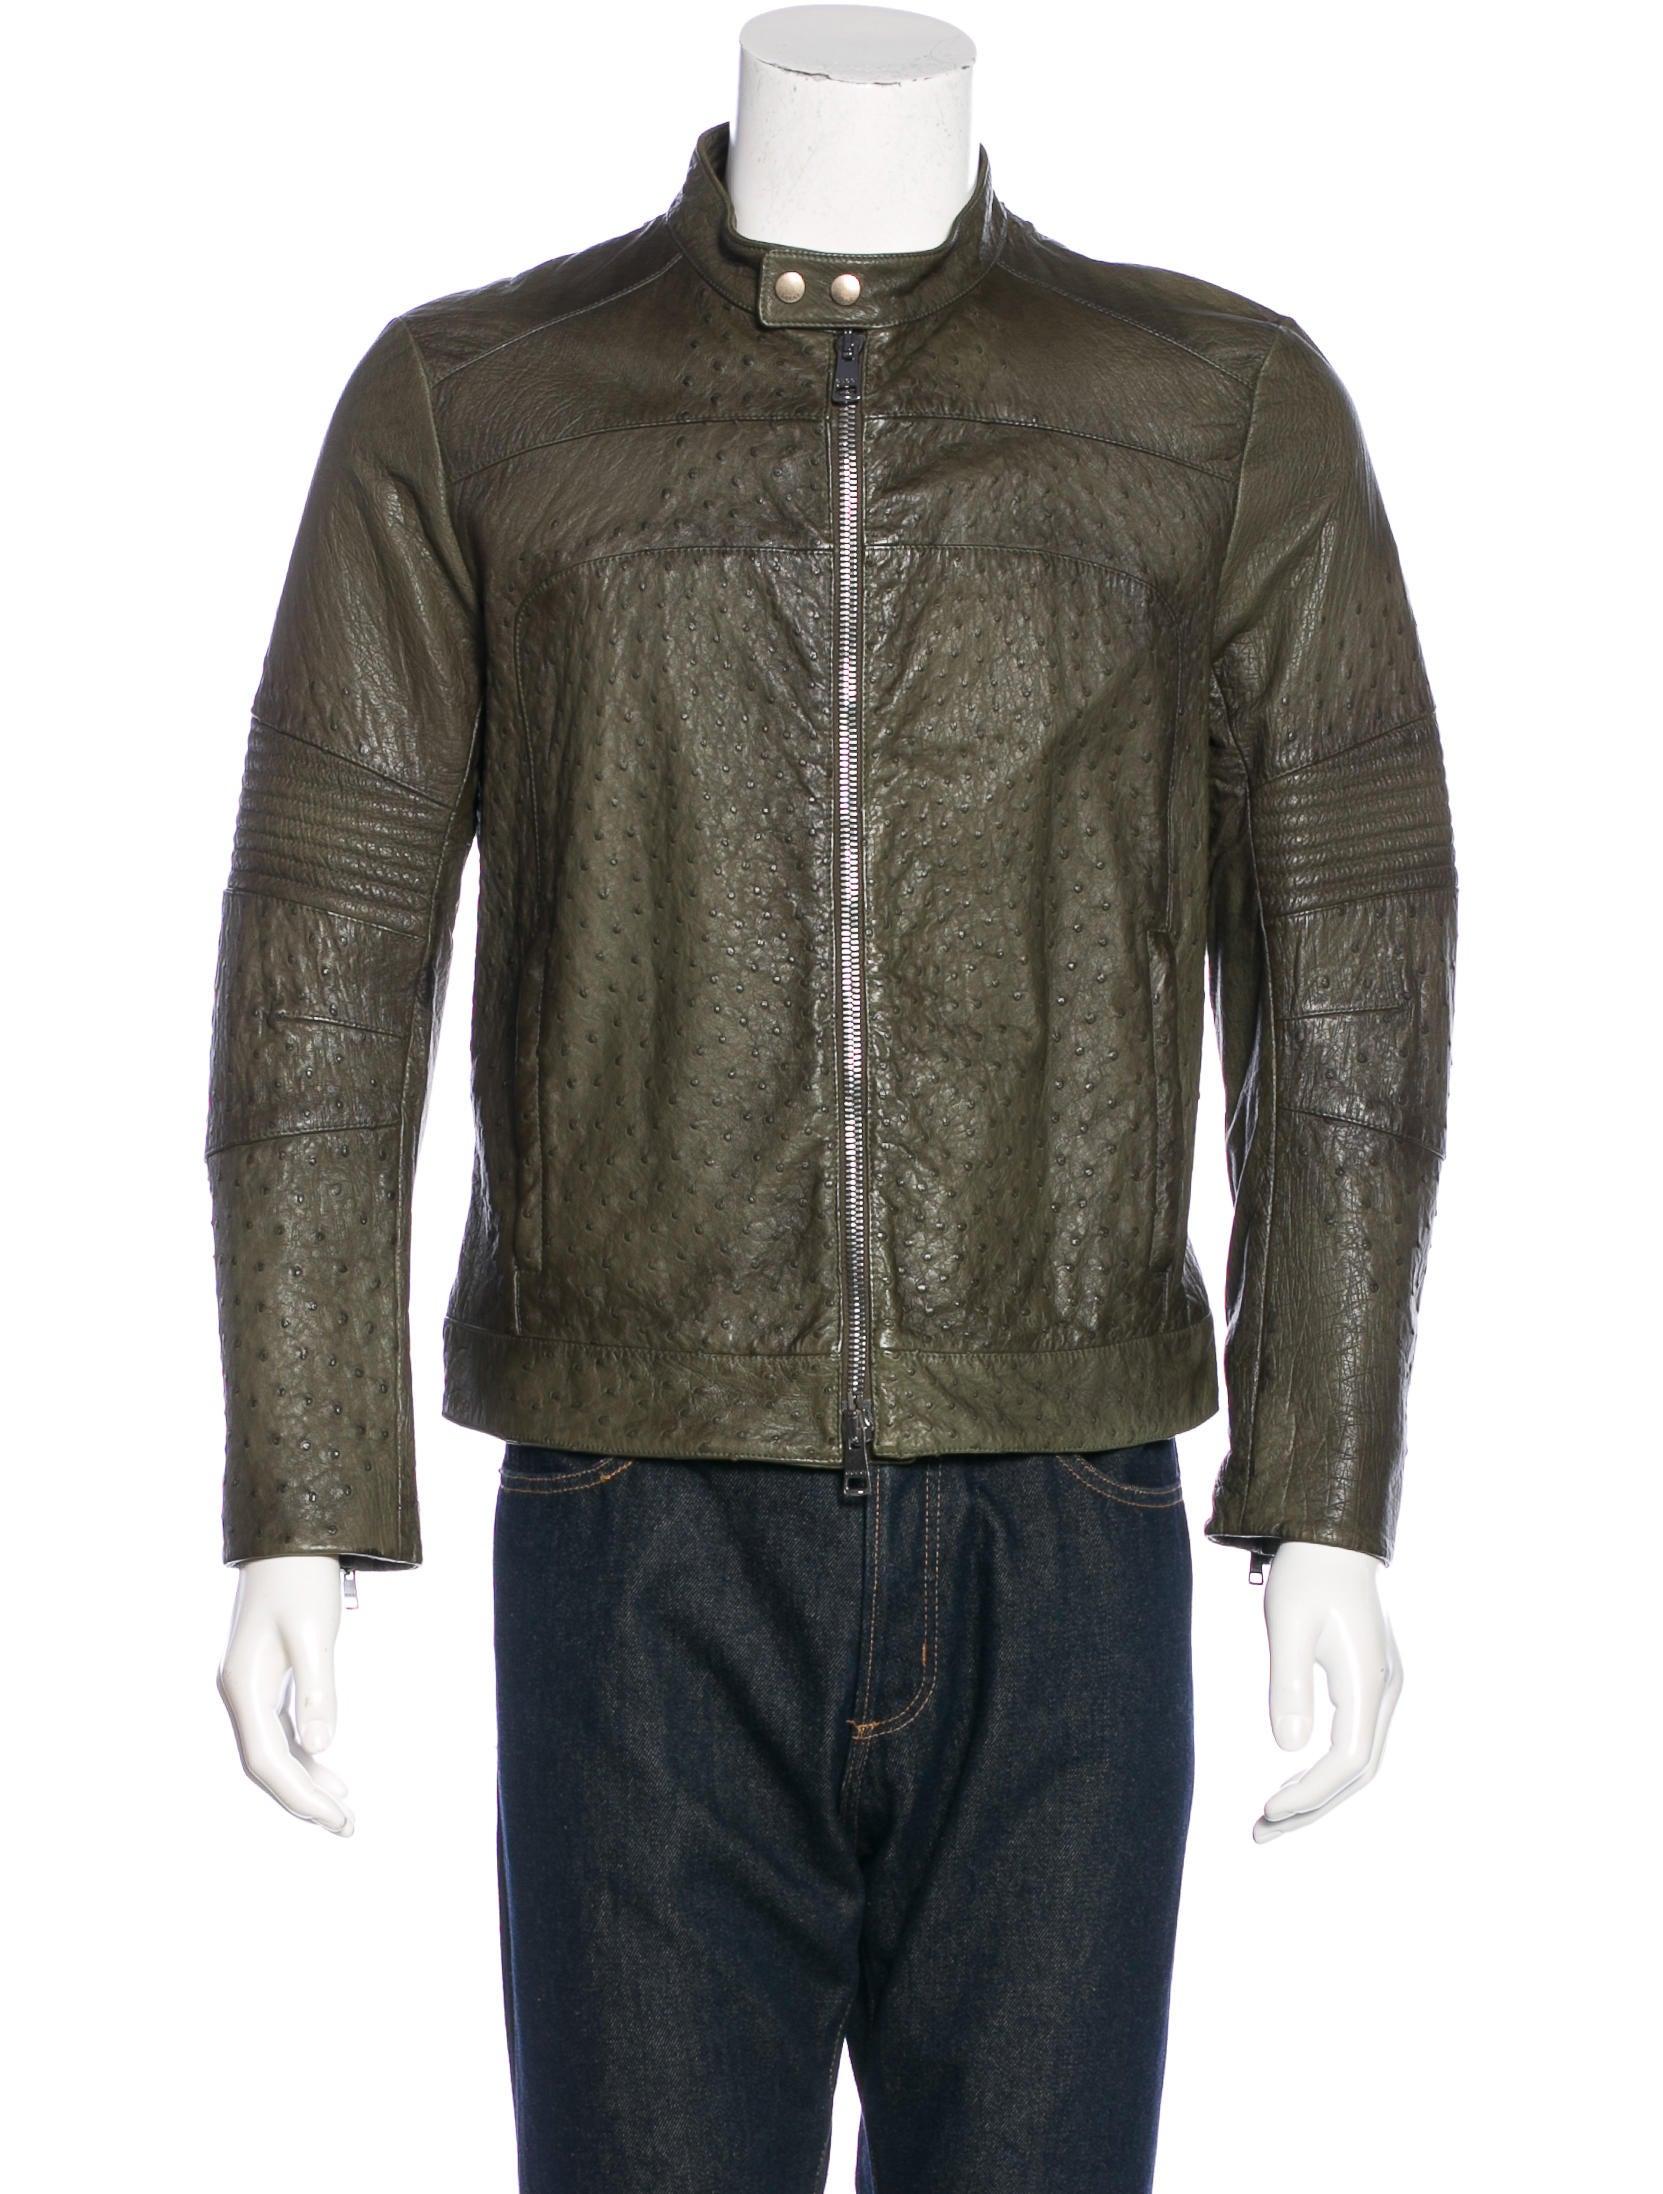 328fa4e6f Gucci Ostrich Biker Jacket - Clothing - GUC134640 | The RealReal